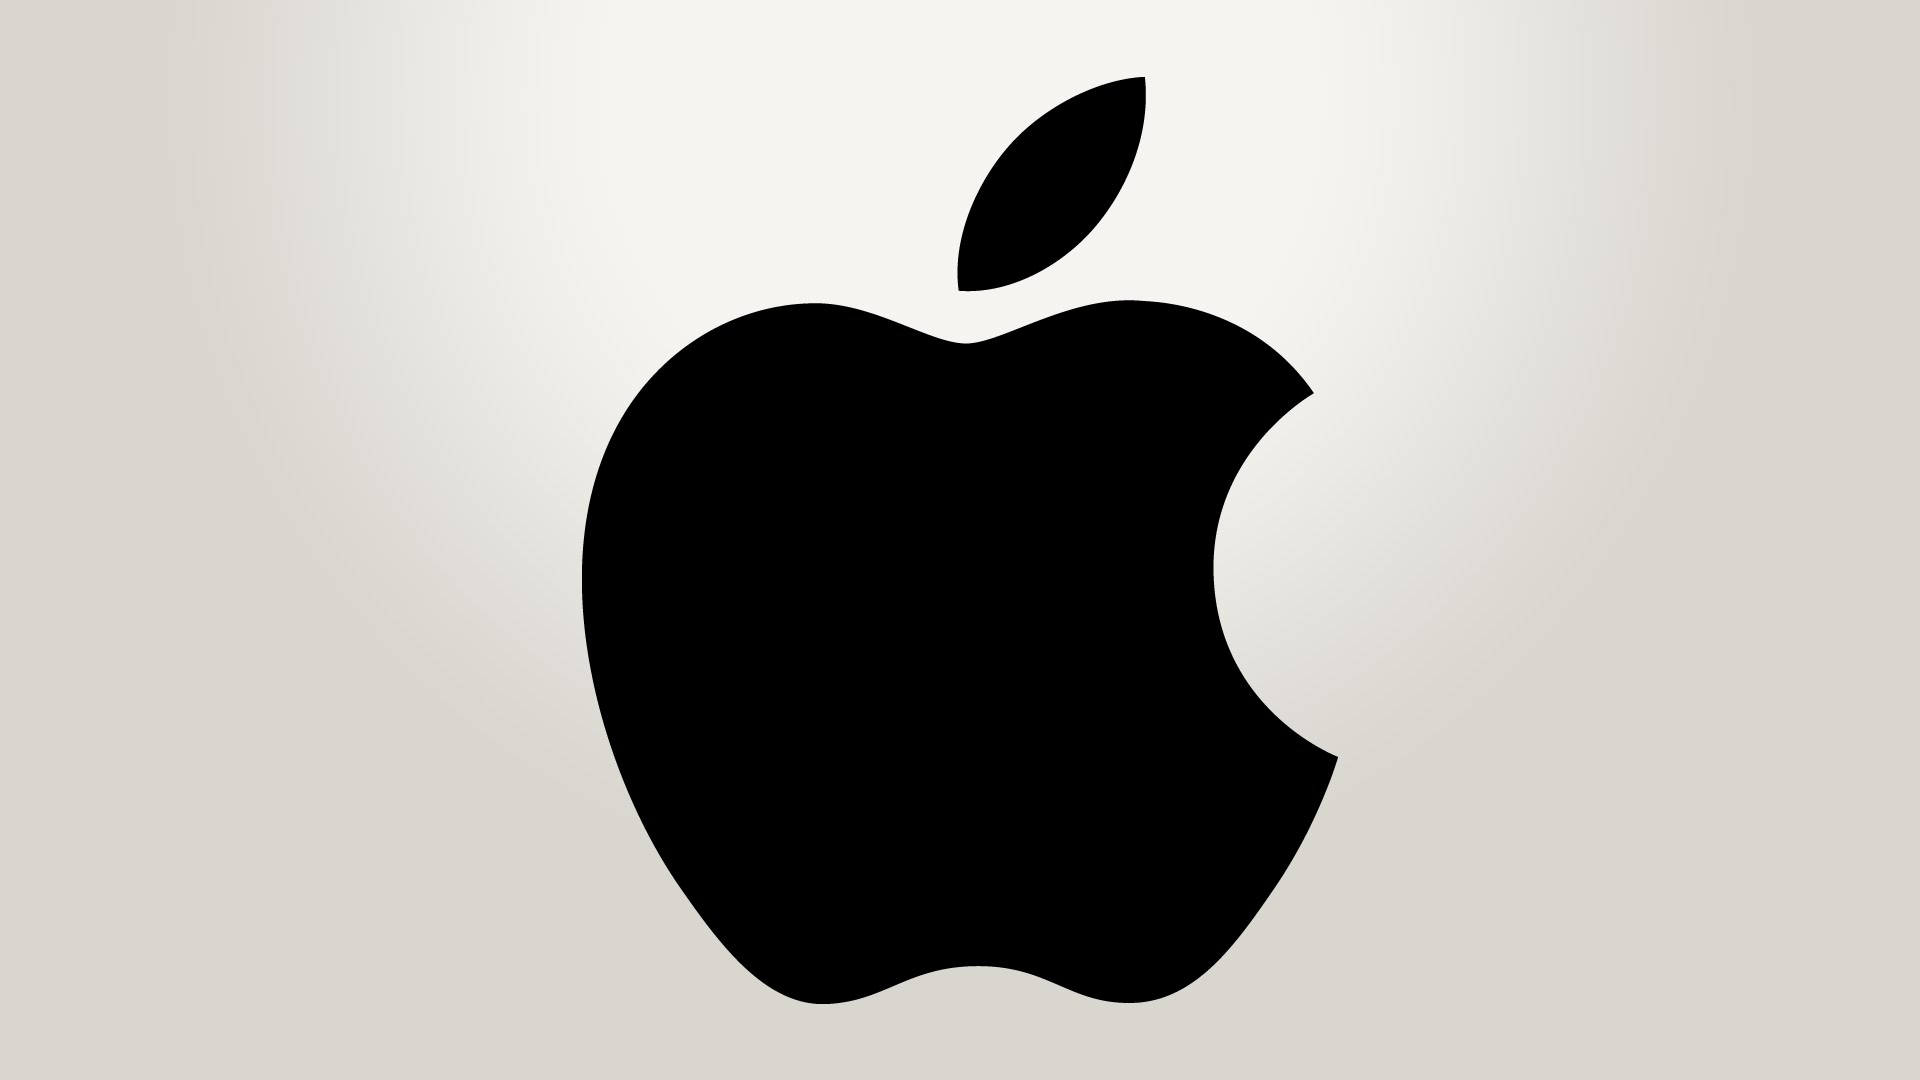 ۱۰ اپلیکیشن جذاب، برنده جایزه دیزاین اپل